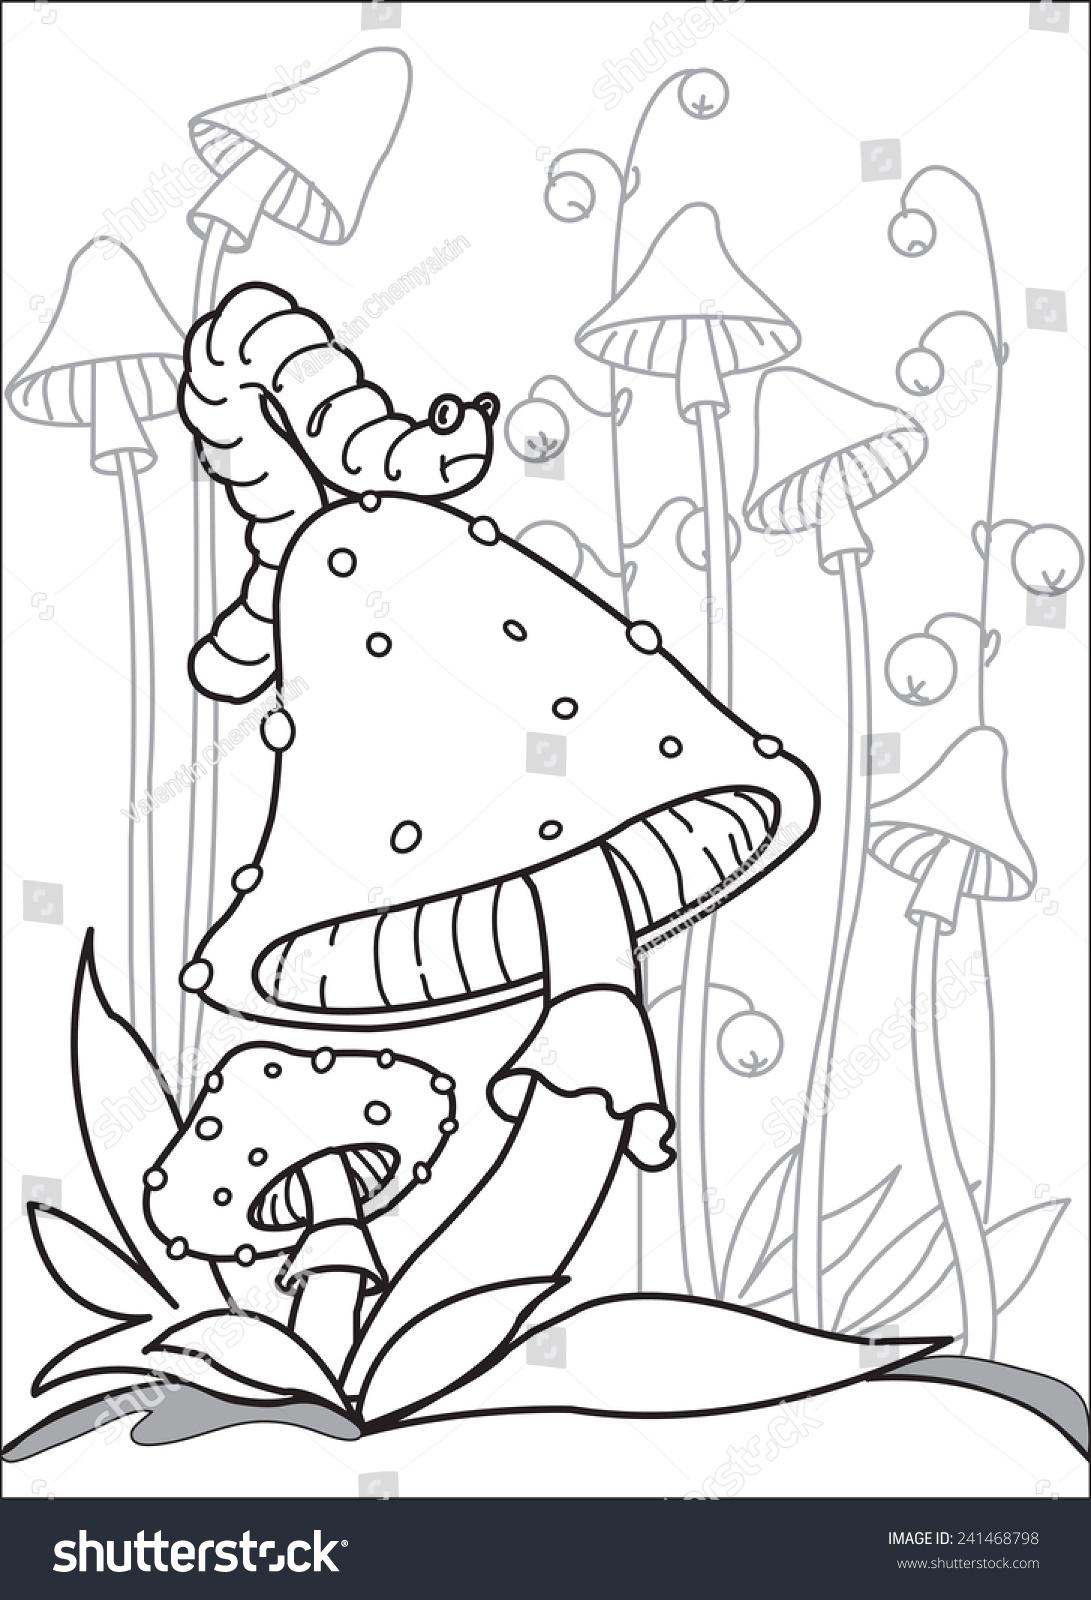 caterpillar on top mushroom big caterpillar stock vector 241468798